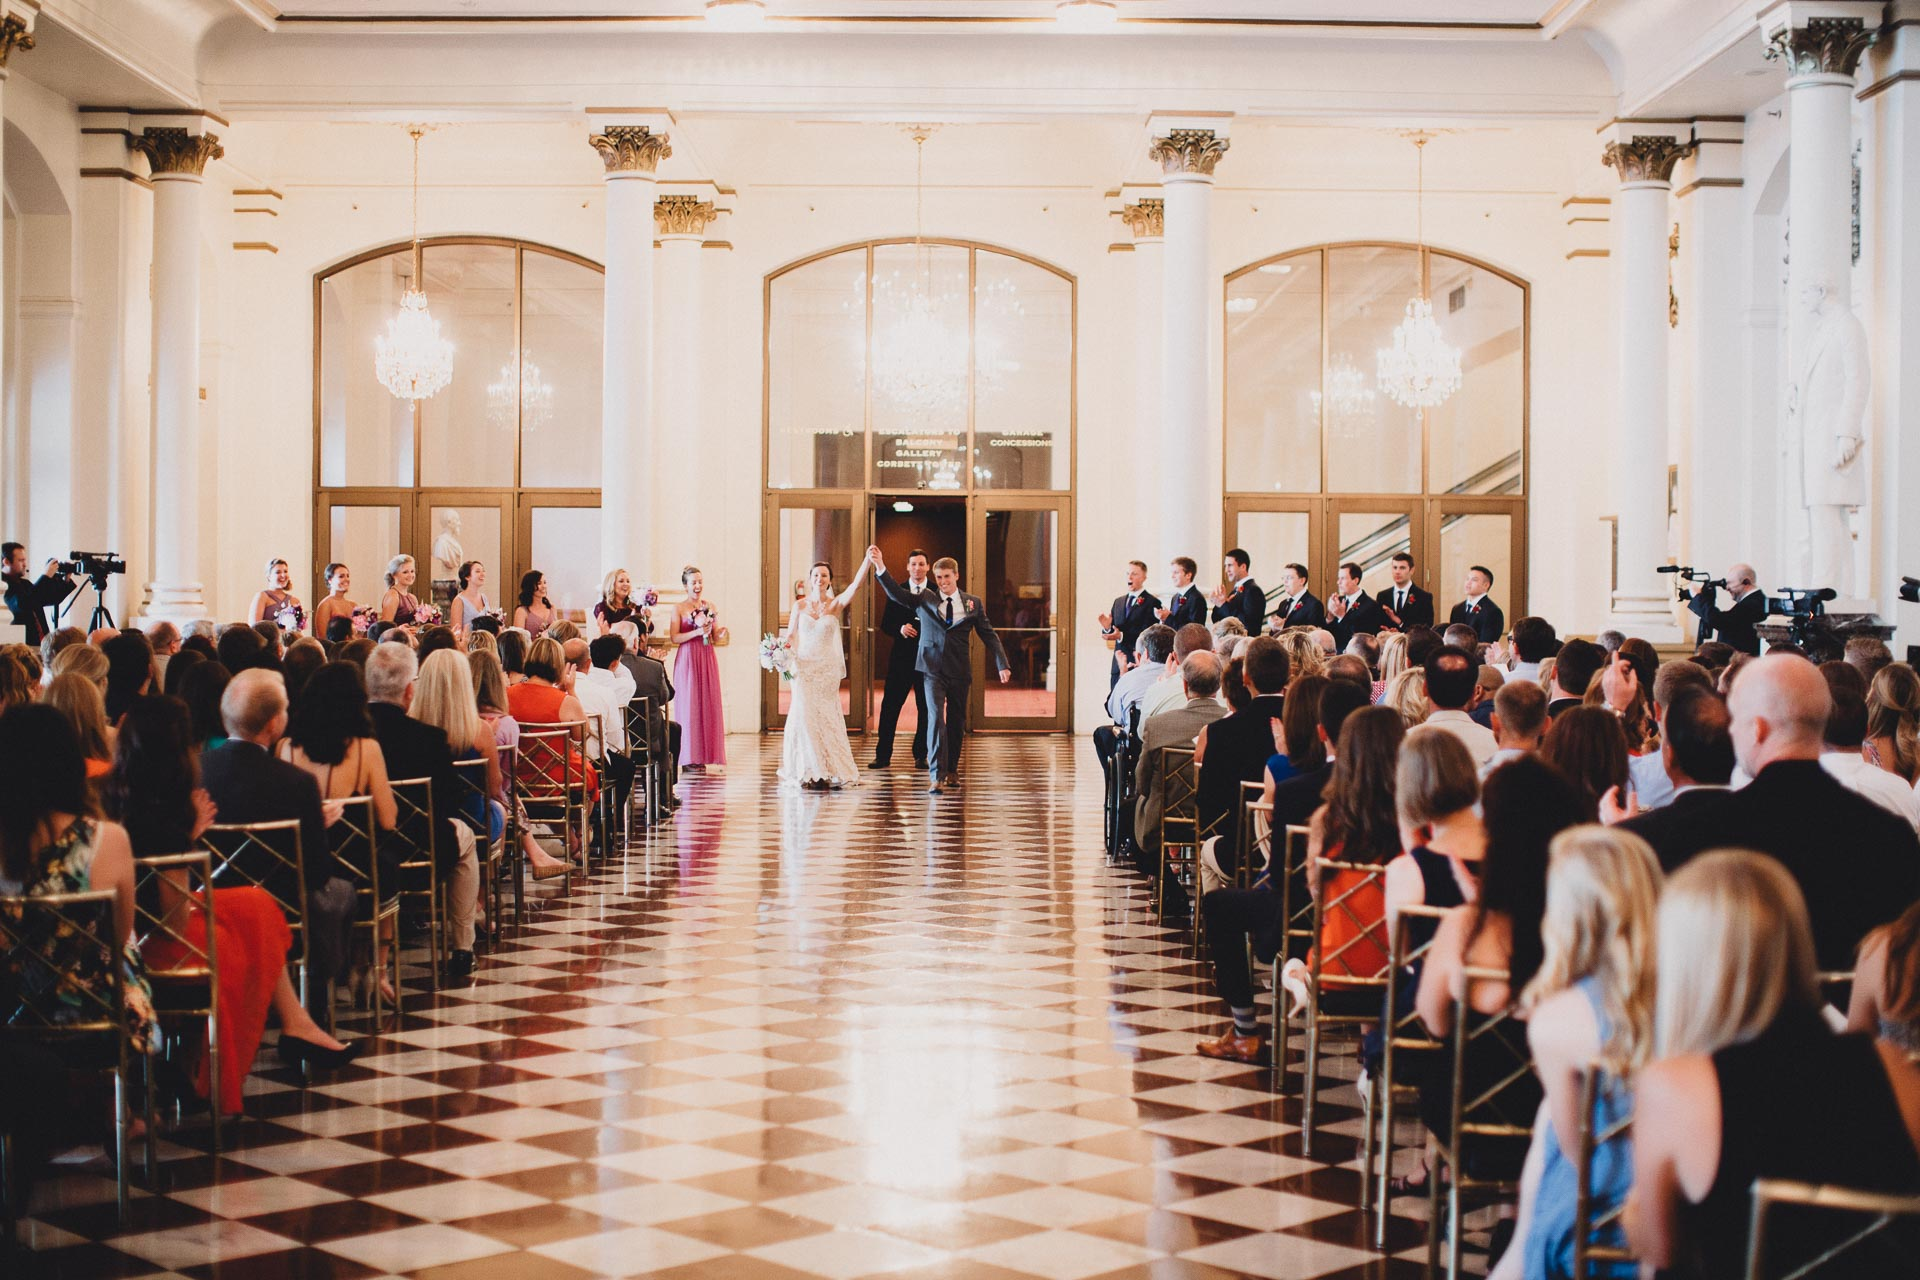 Julia-Michael-Cincinnati-Music-Hall-Wedding-110@2x.jpg